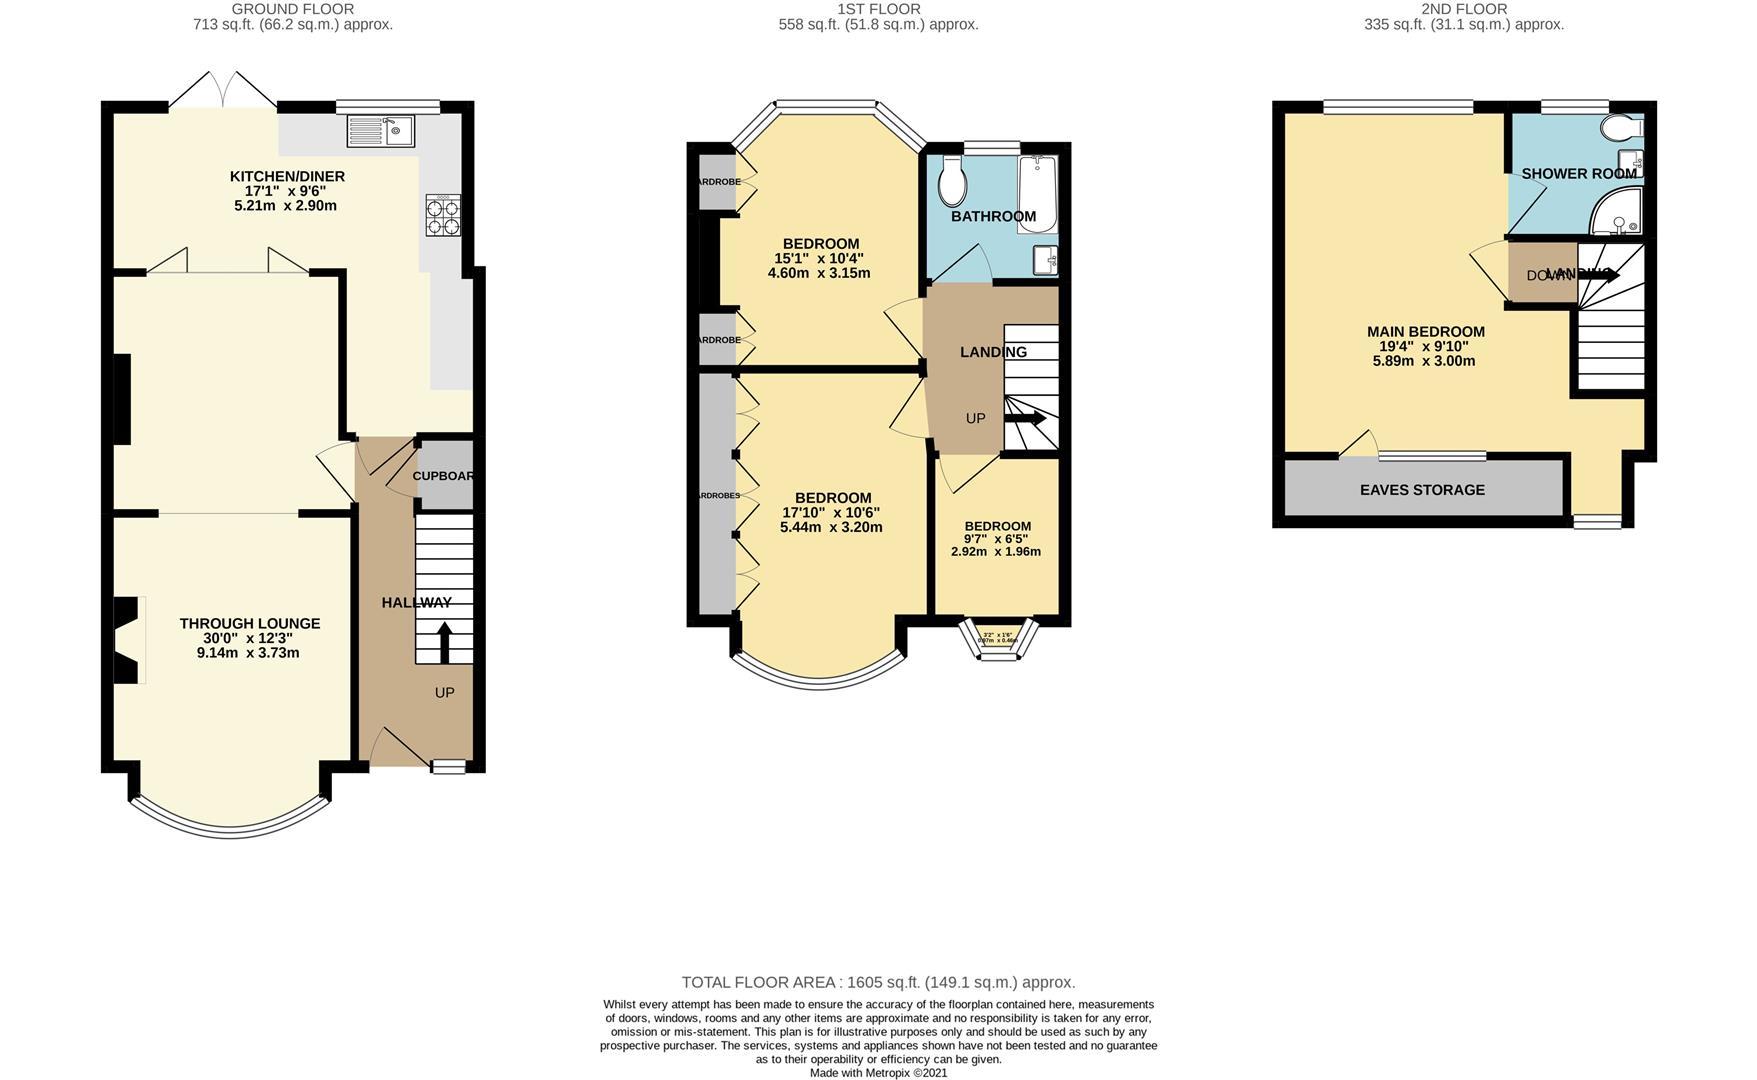 HamiltonCrescentN13-Floorplan.jpg